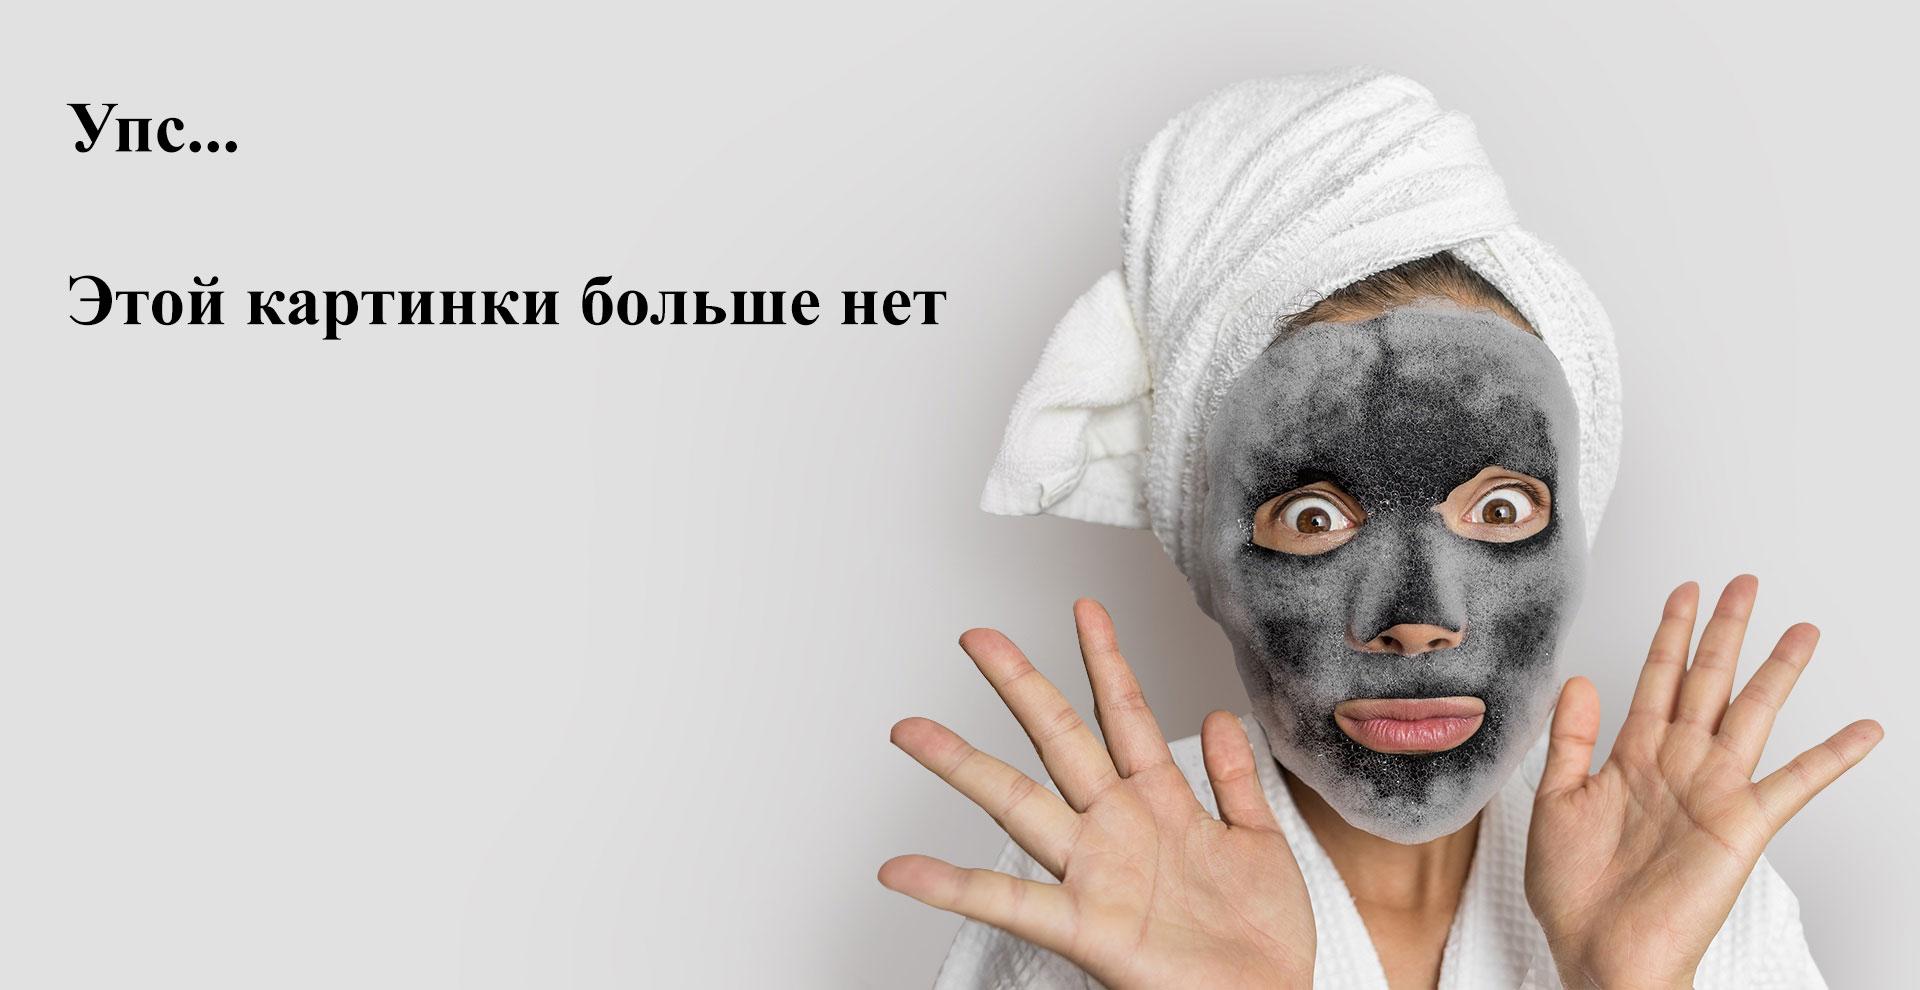 Staleks, Терка для стоп Beauty/Care 12/1, пластиковая, 80